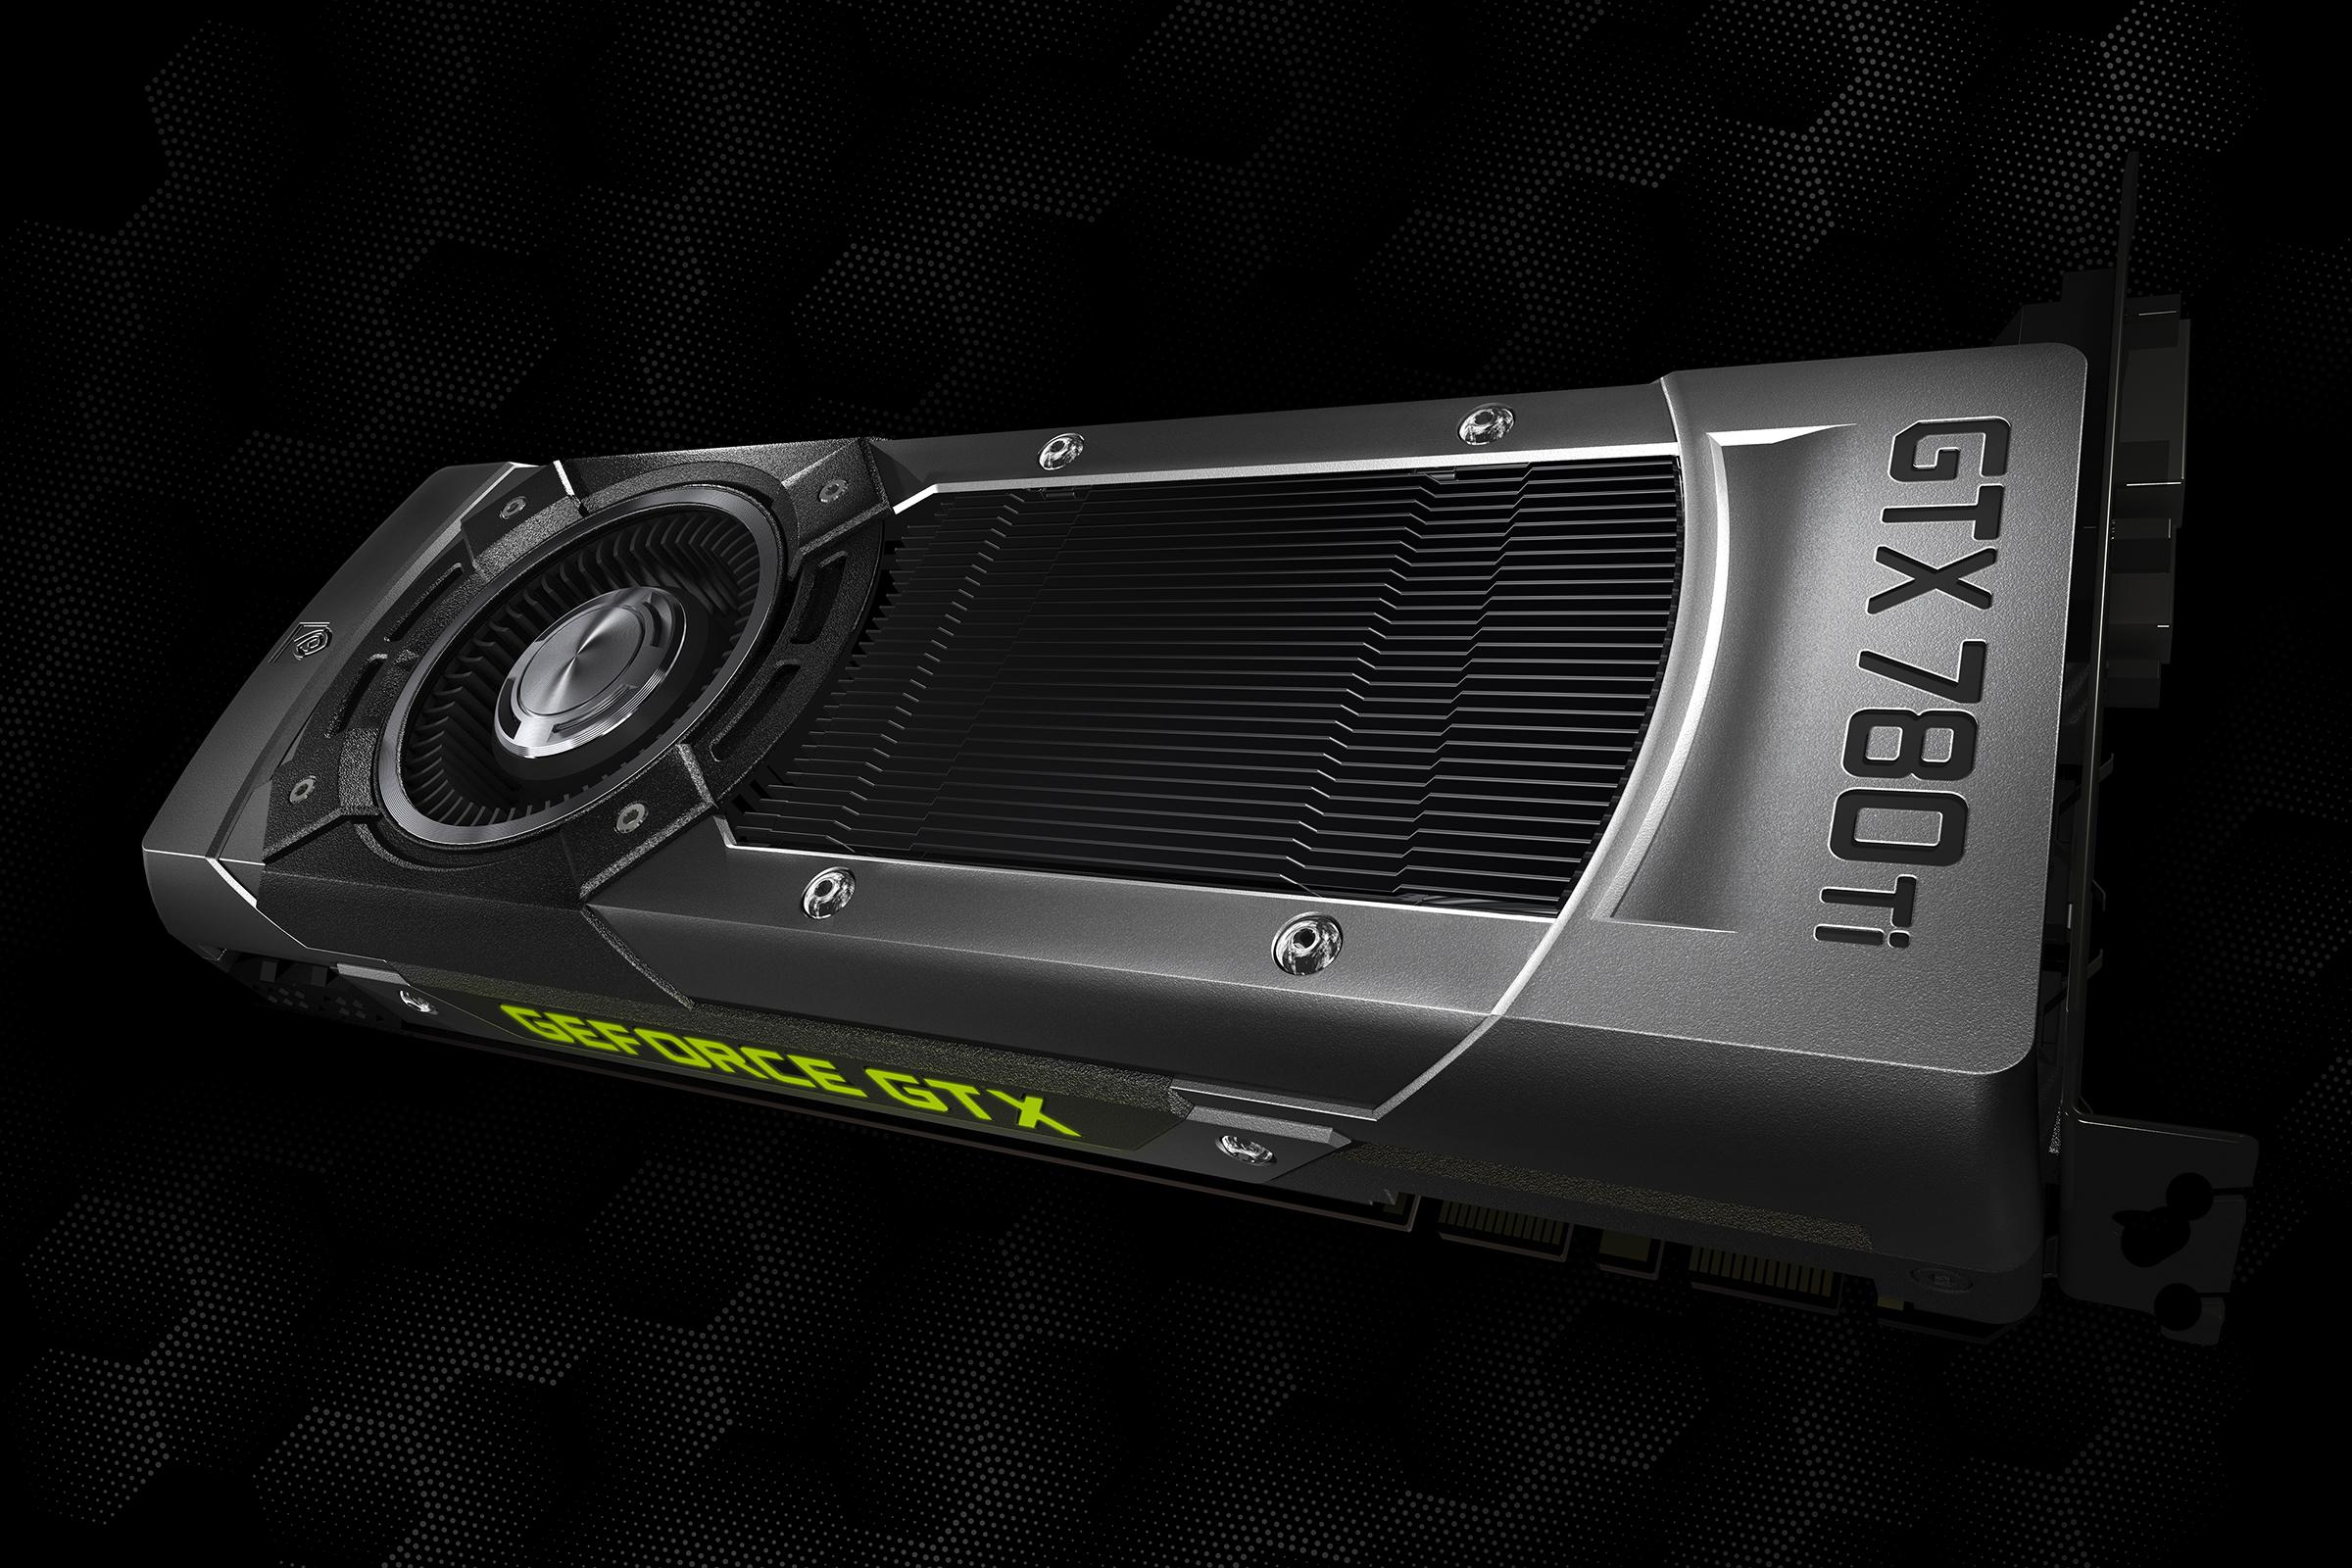 GeForce 337.50 Beta Driver Details, Specs and Download Information